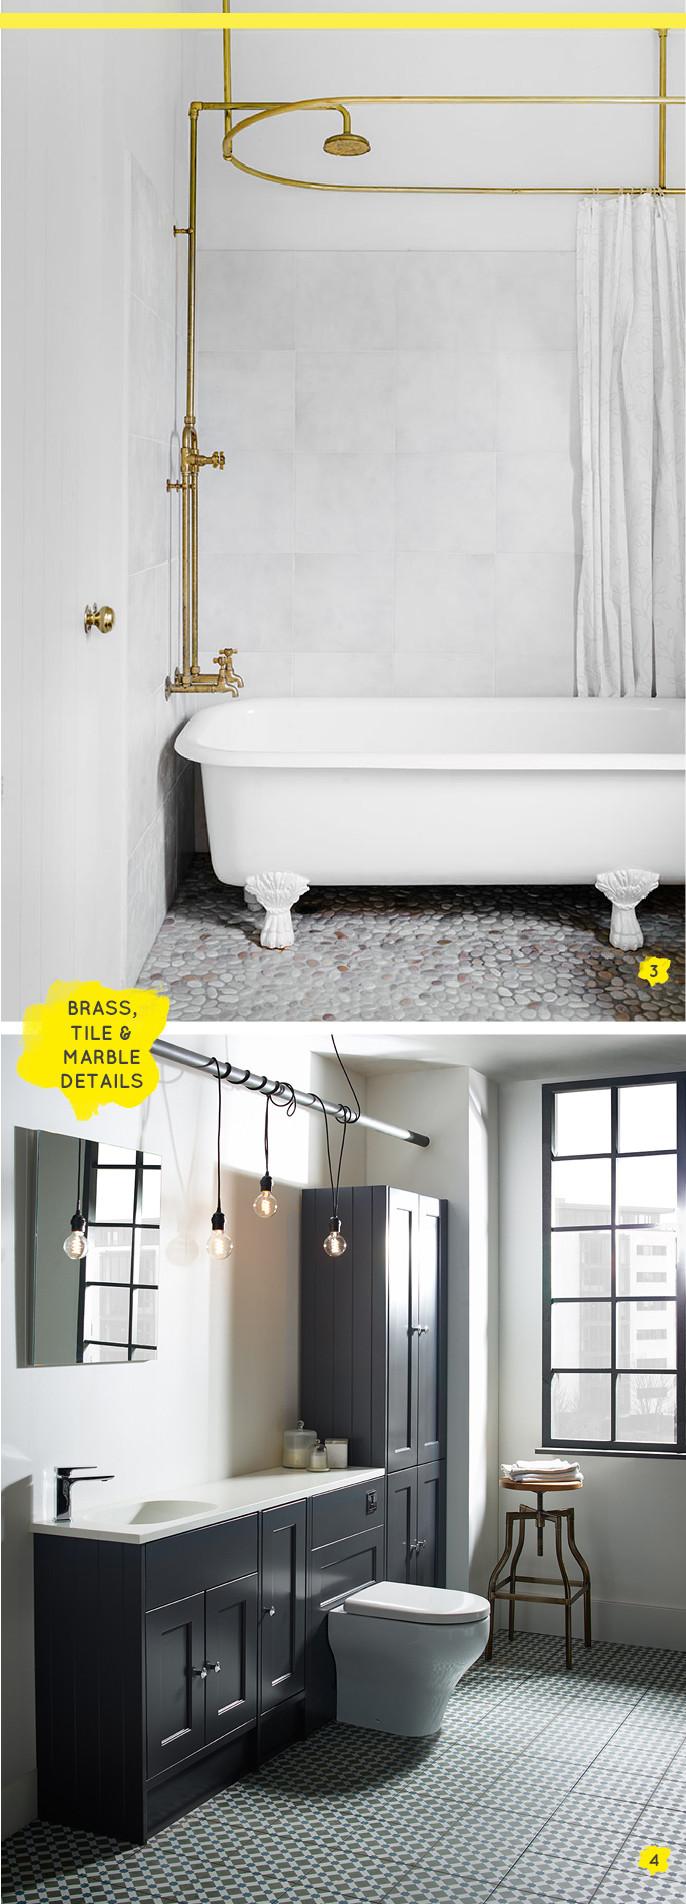 Bathroom Inspiration2